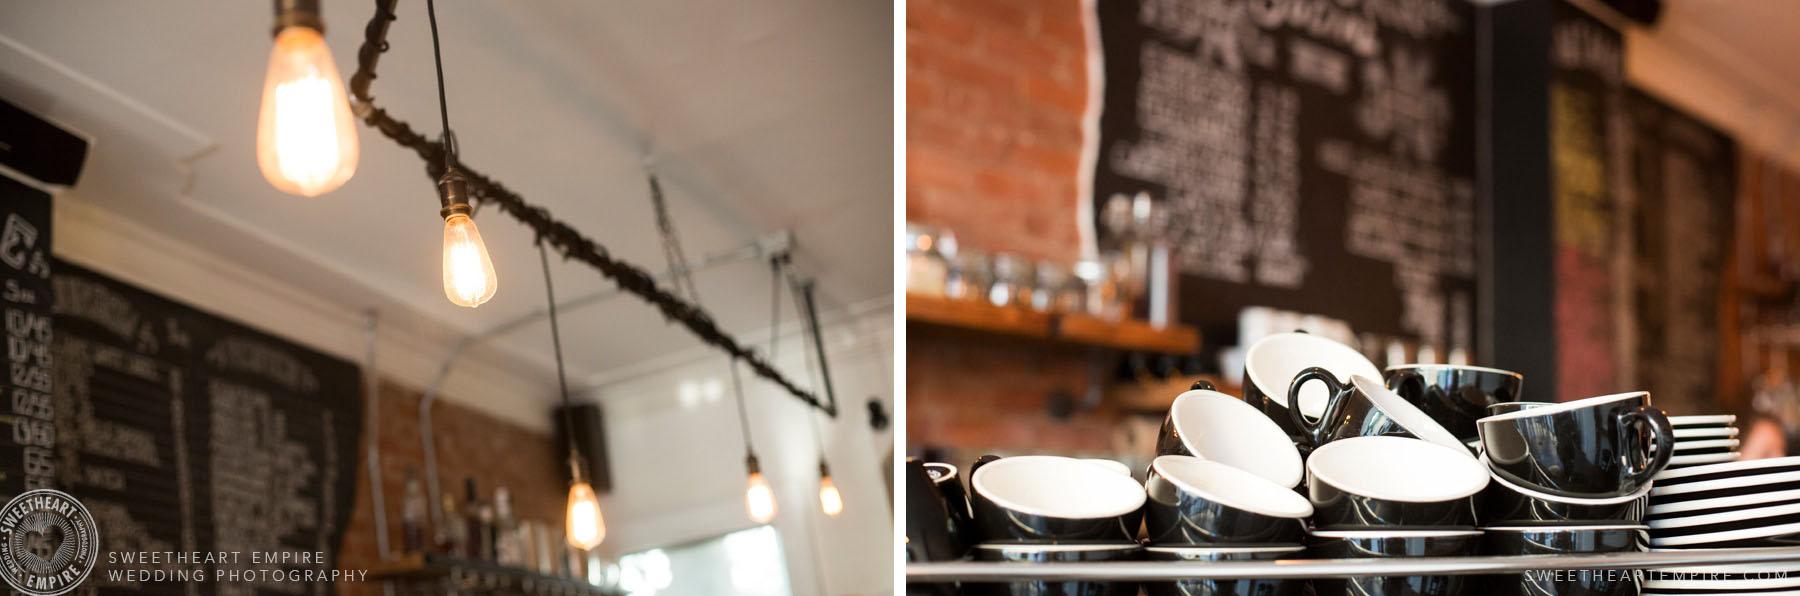 14_Boxcar-Social-Cafe-Engagement-Photos